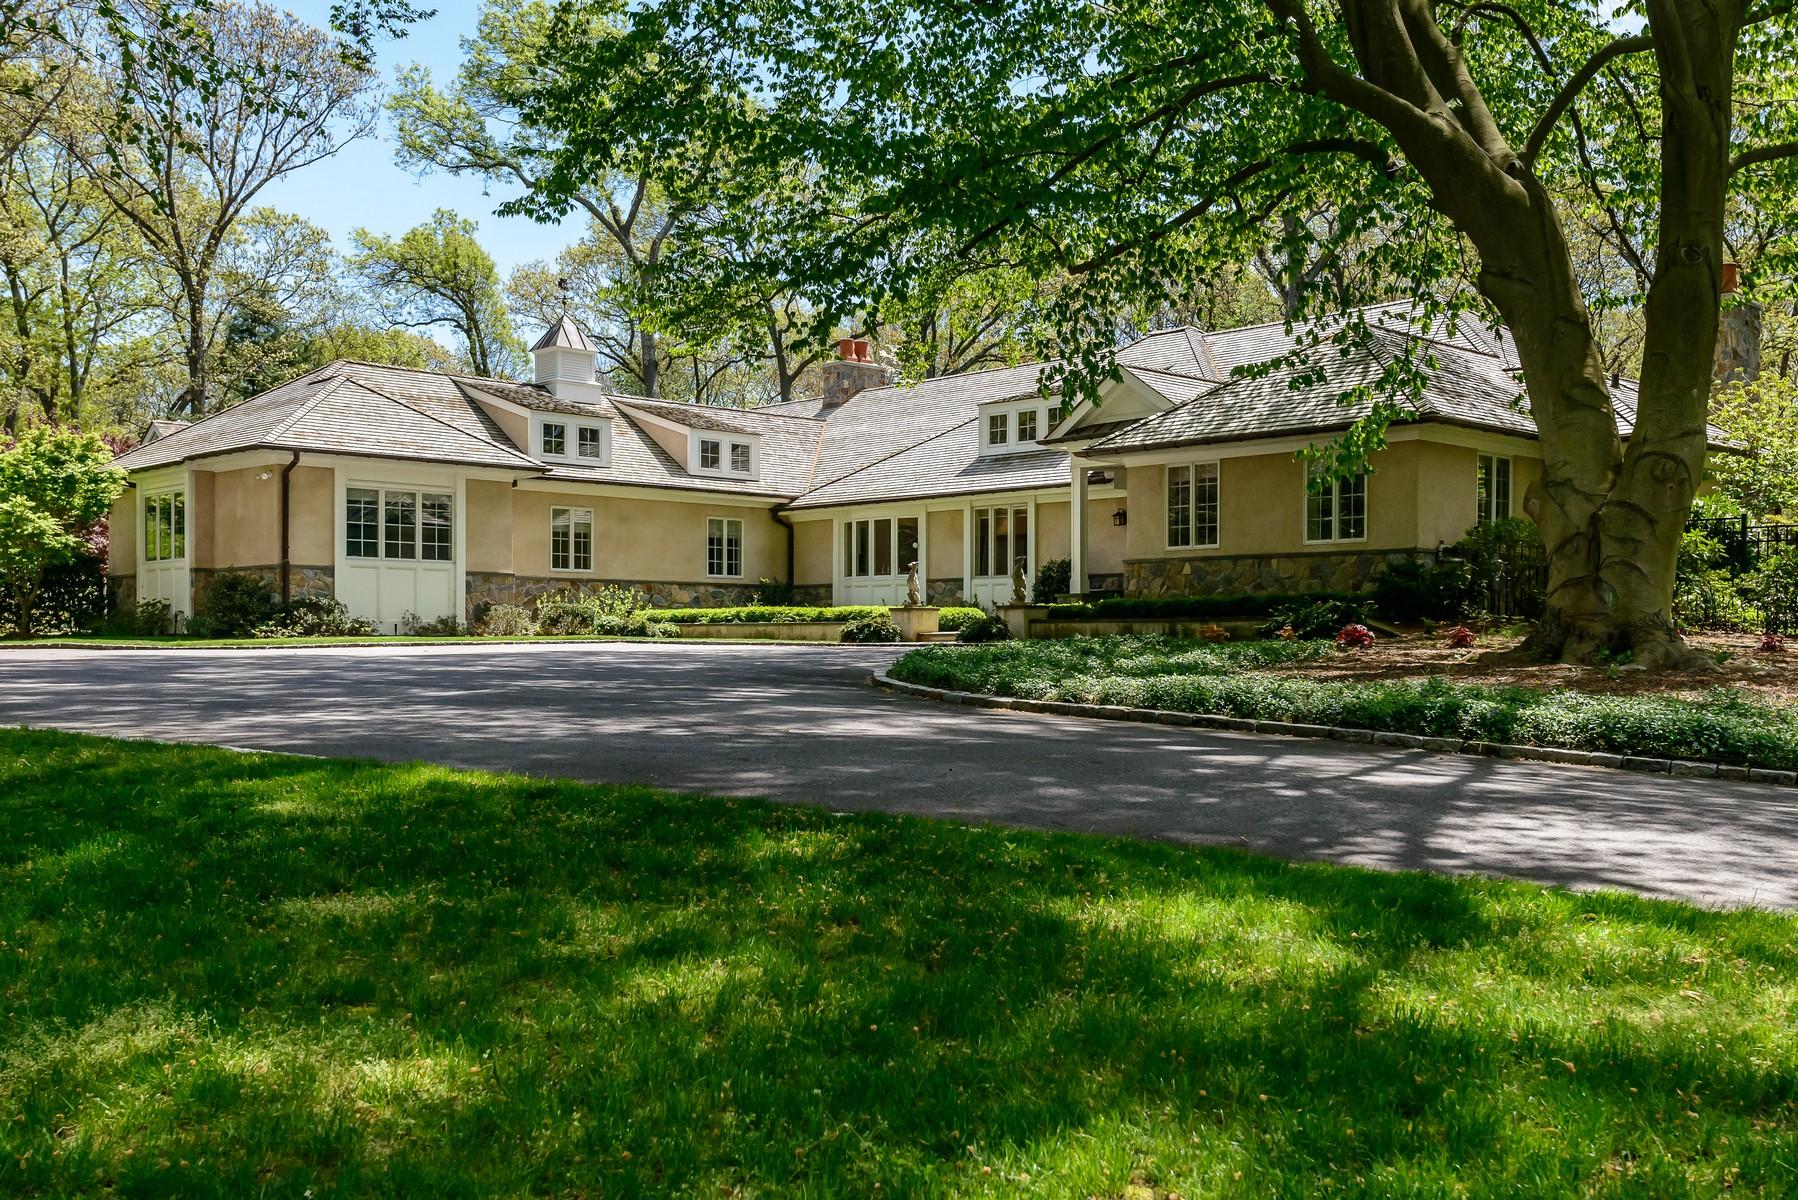 Casa para uma família para Venda às Ranch 70 Wheatley Rd Brookville, Nova York, 11545 Estados Unidos